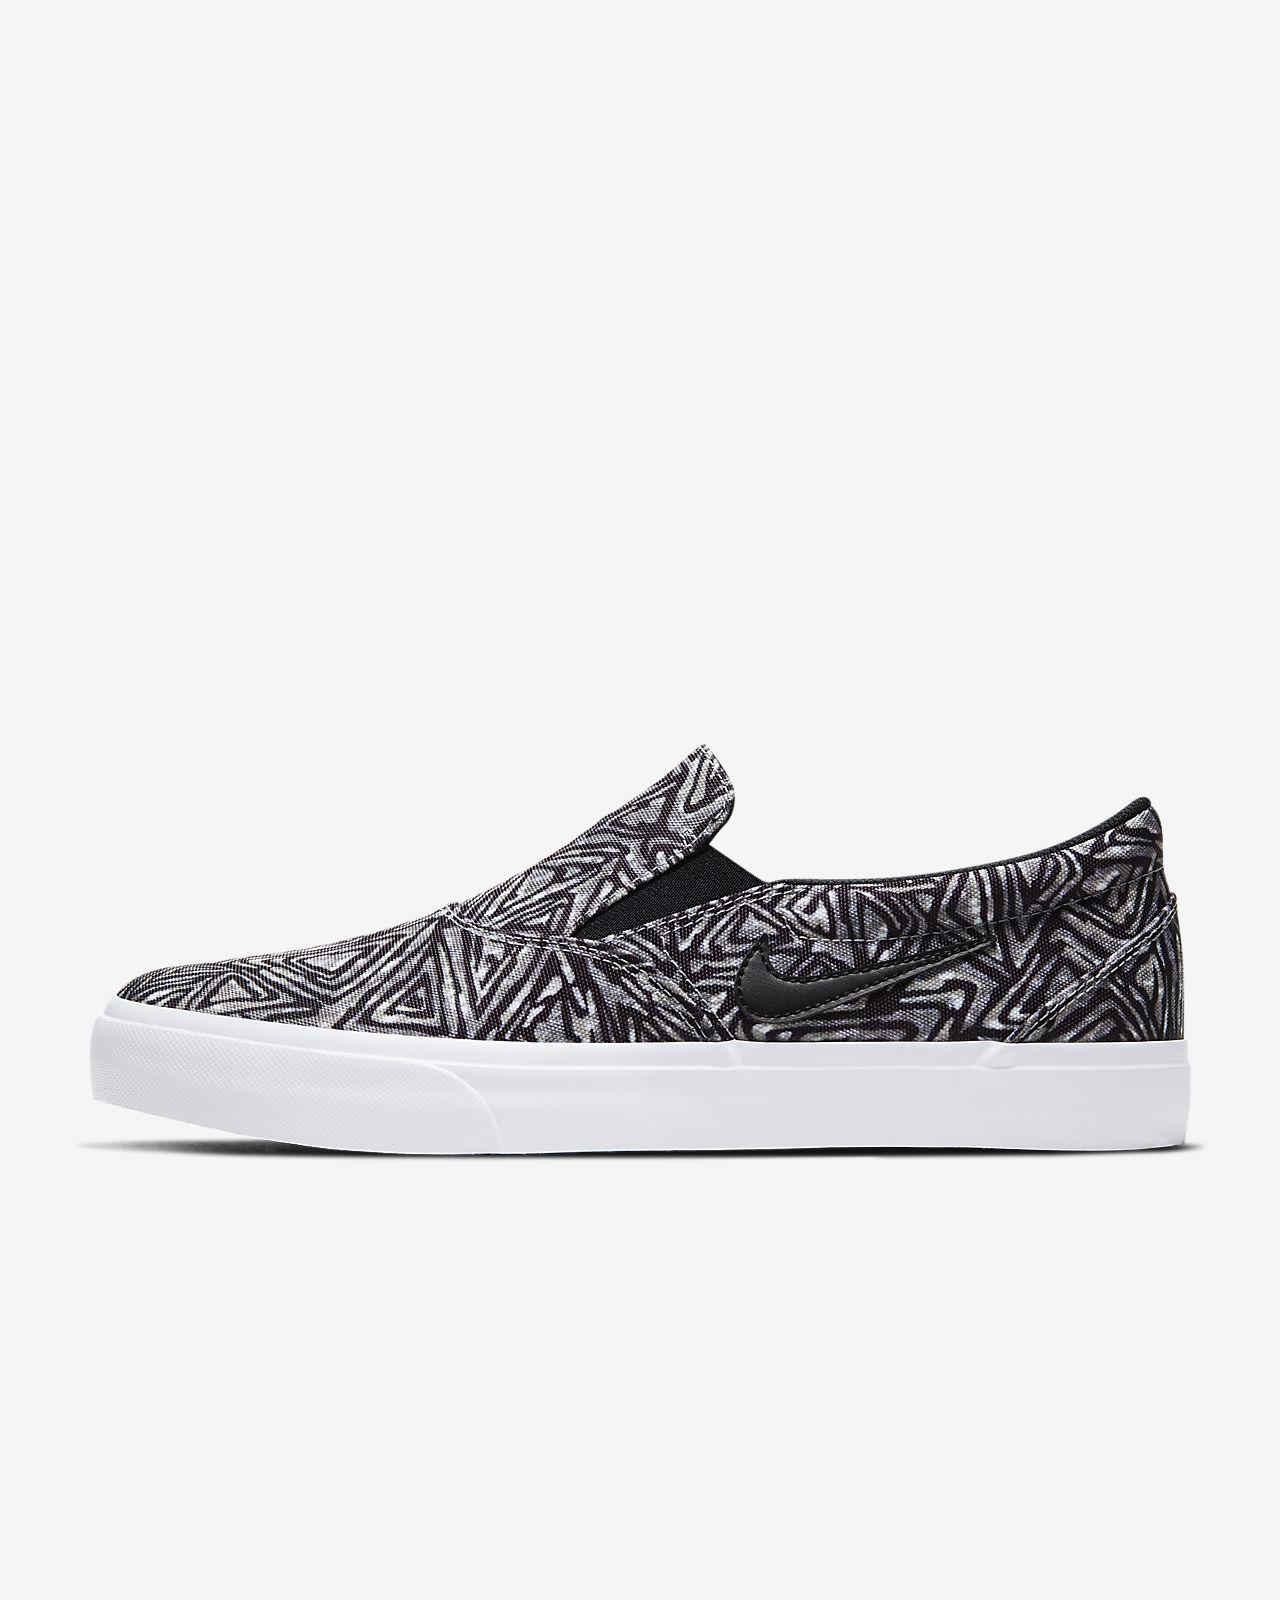 Nike SB Charge Slip Premium 滑板鞋